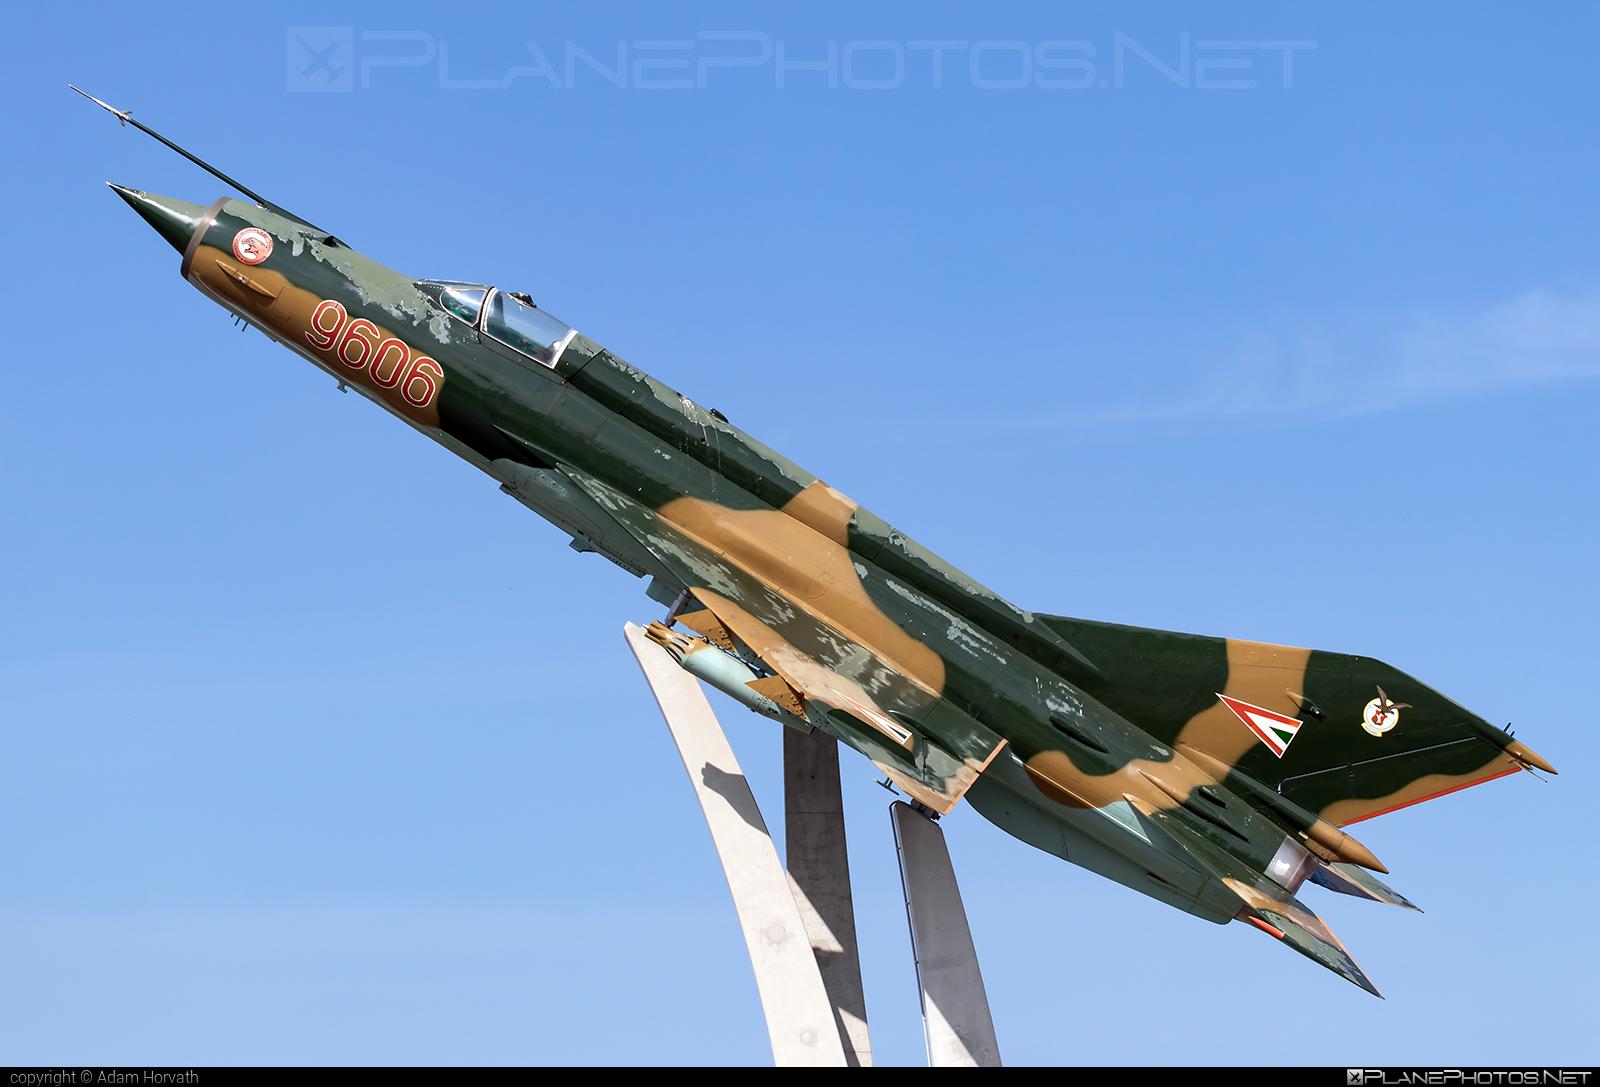 Mikoyan-Gurevich MiG-21MF - 9606 operated by Magyar Légierő (Hungarian Air Force) #hungarianairforce #magyarlegiero #mig #mig21 #mig21mf #mikoyangurevich